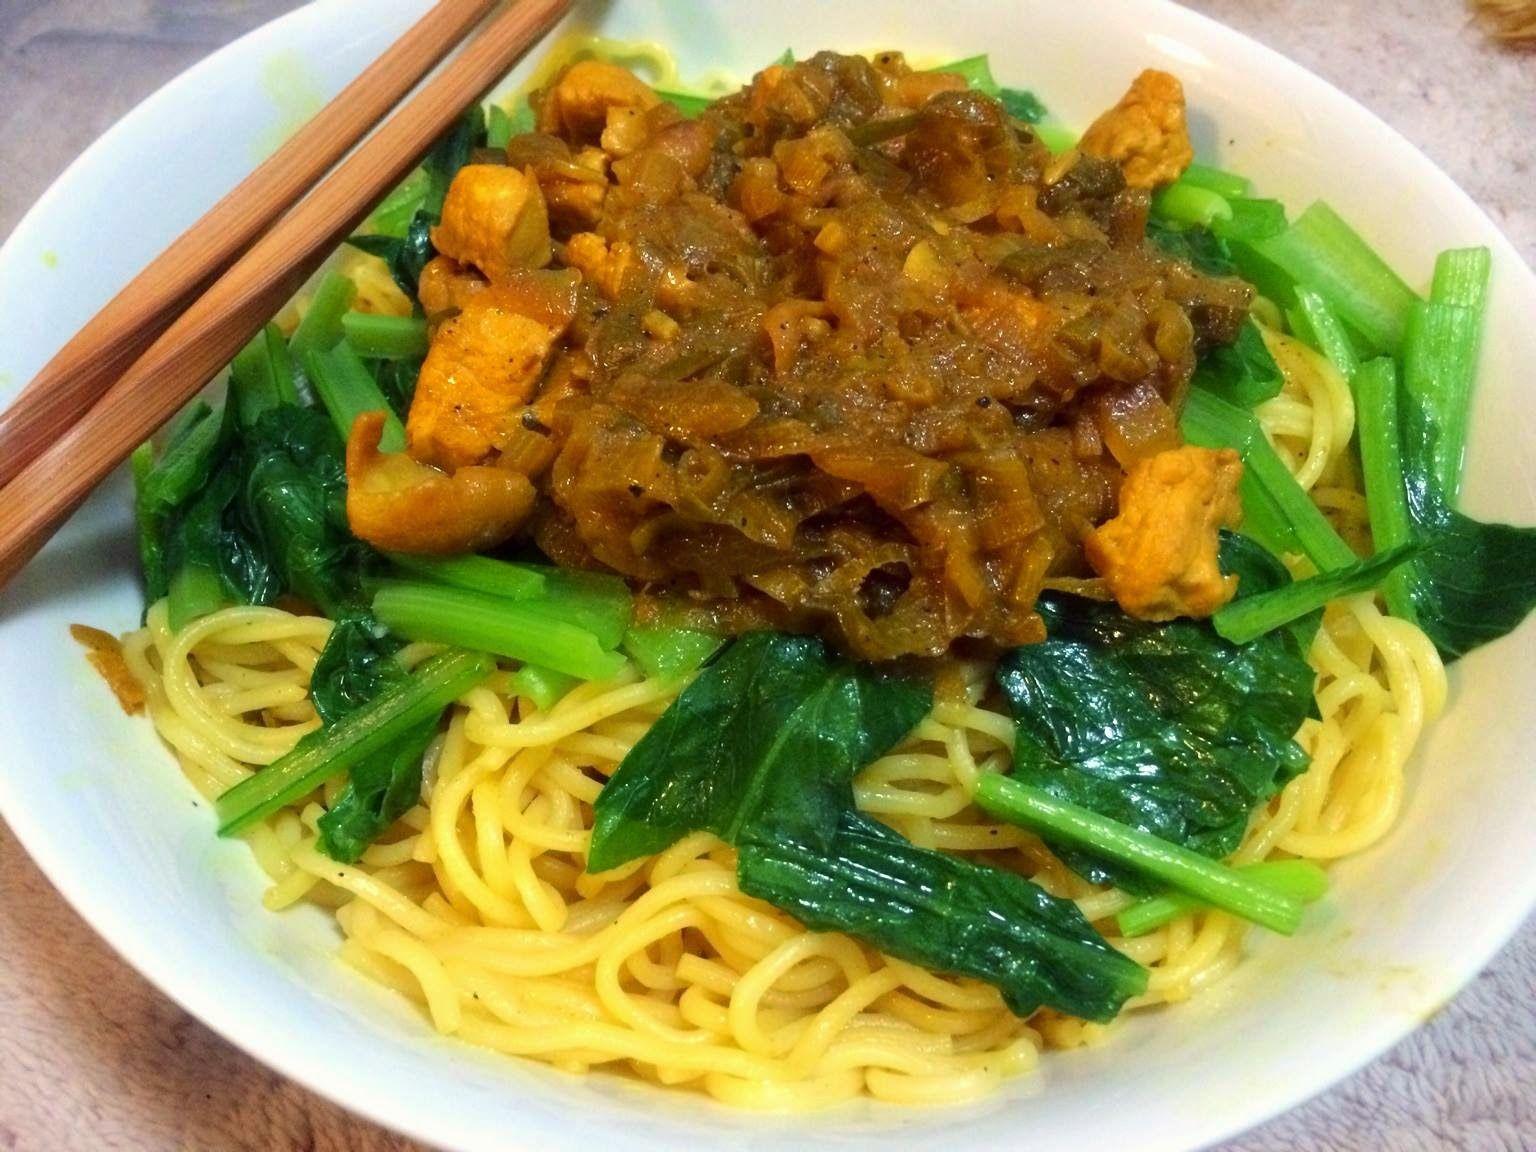 Resep Masakan Indonesia Mie Ayam Pedas